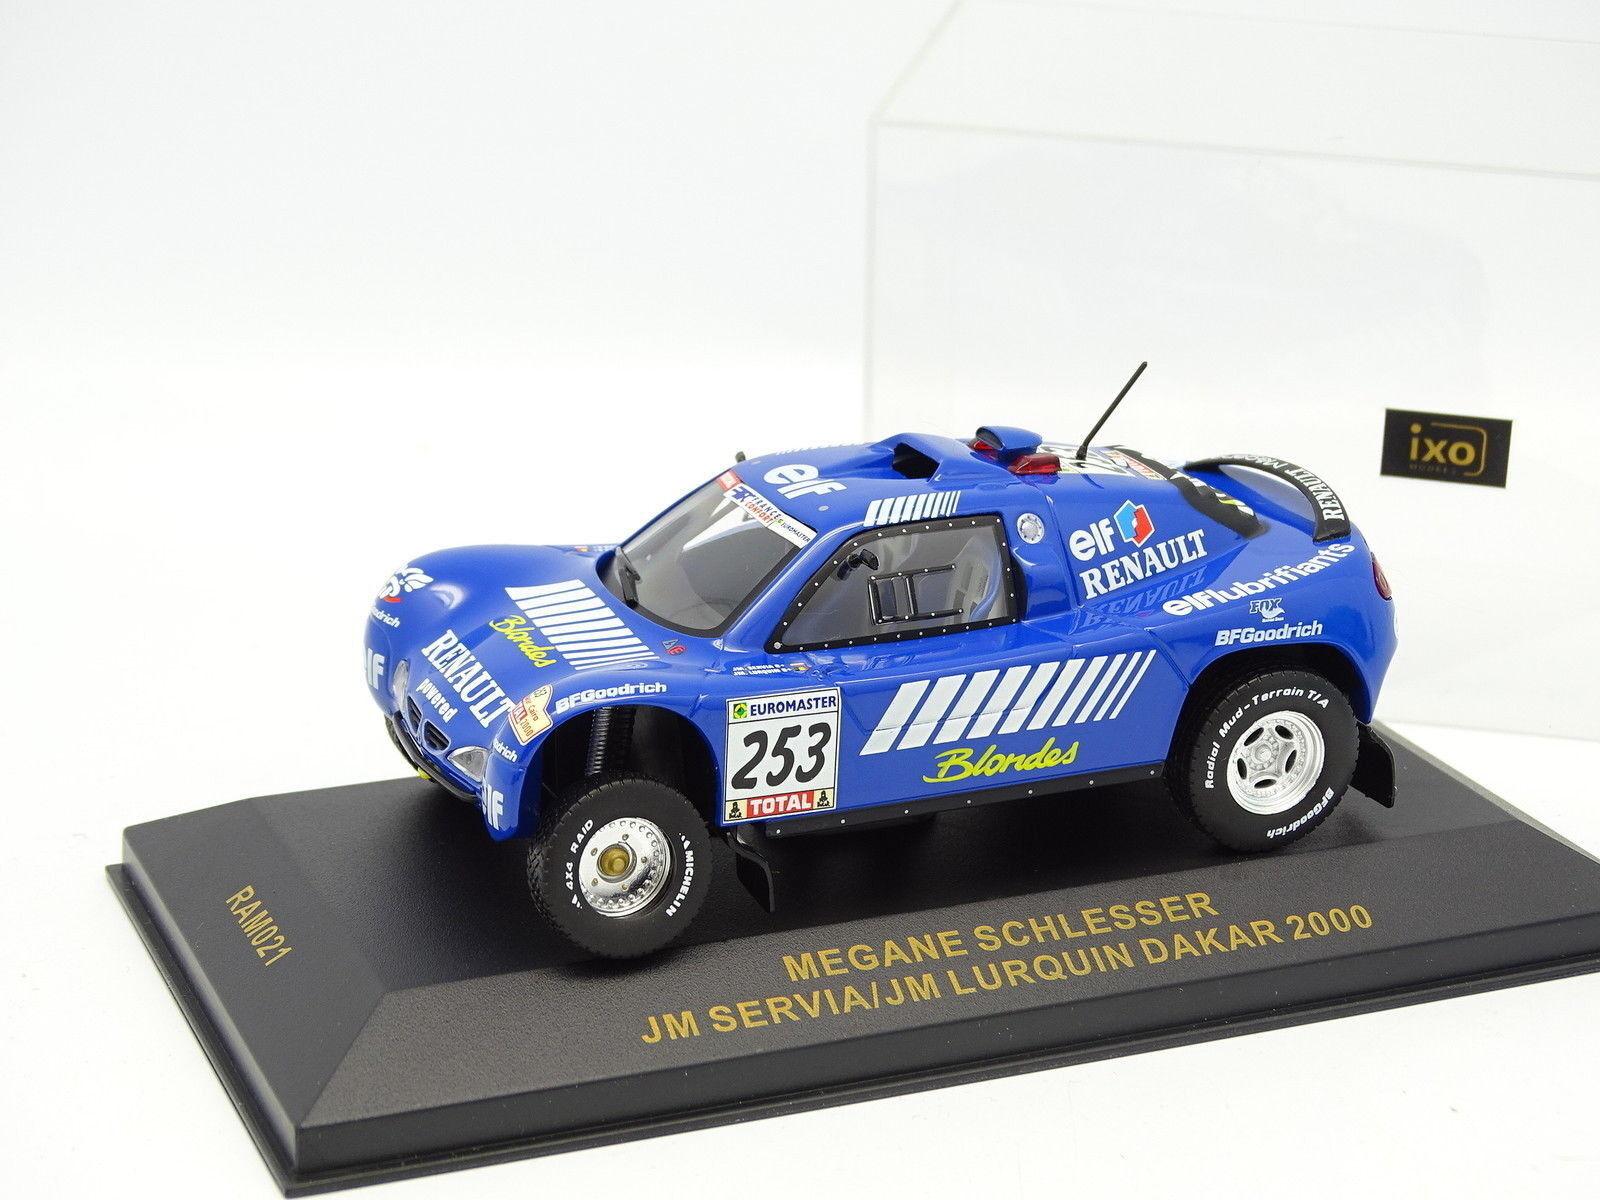 Ixo 1 43 - Megane Schlesser Paris Dakar 2000 No.253